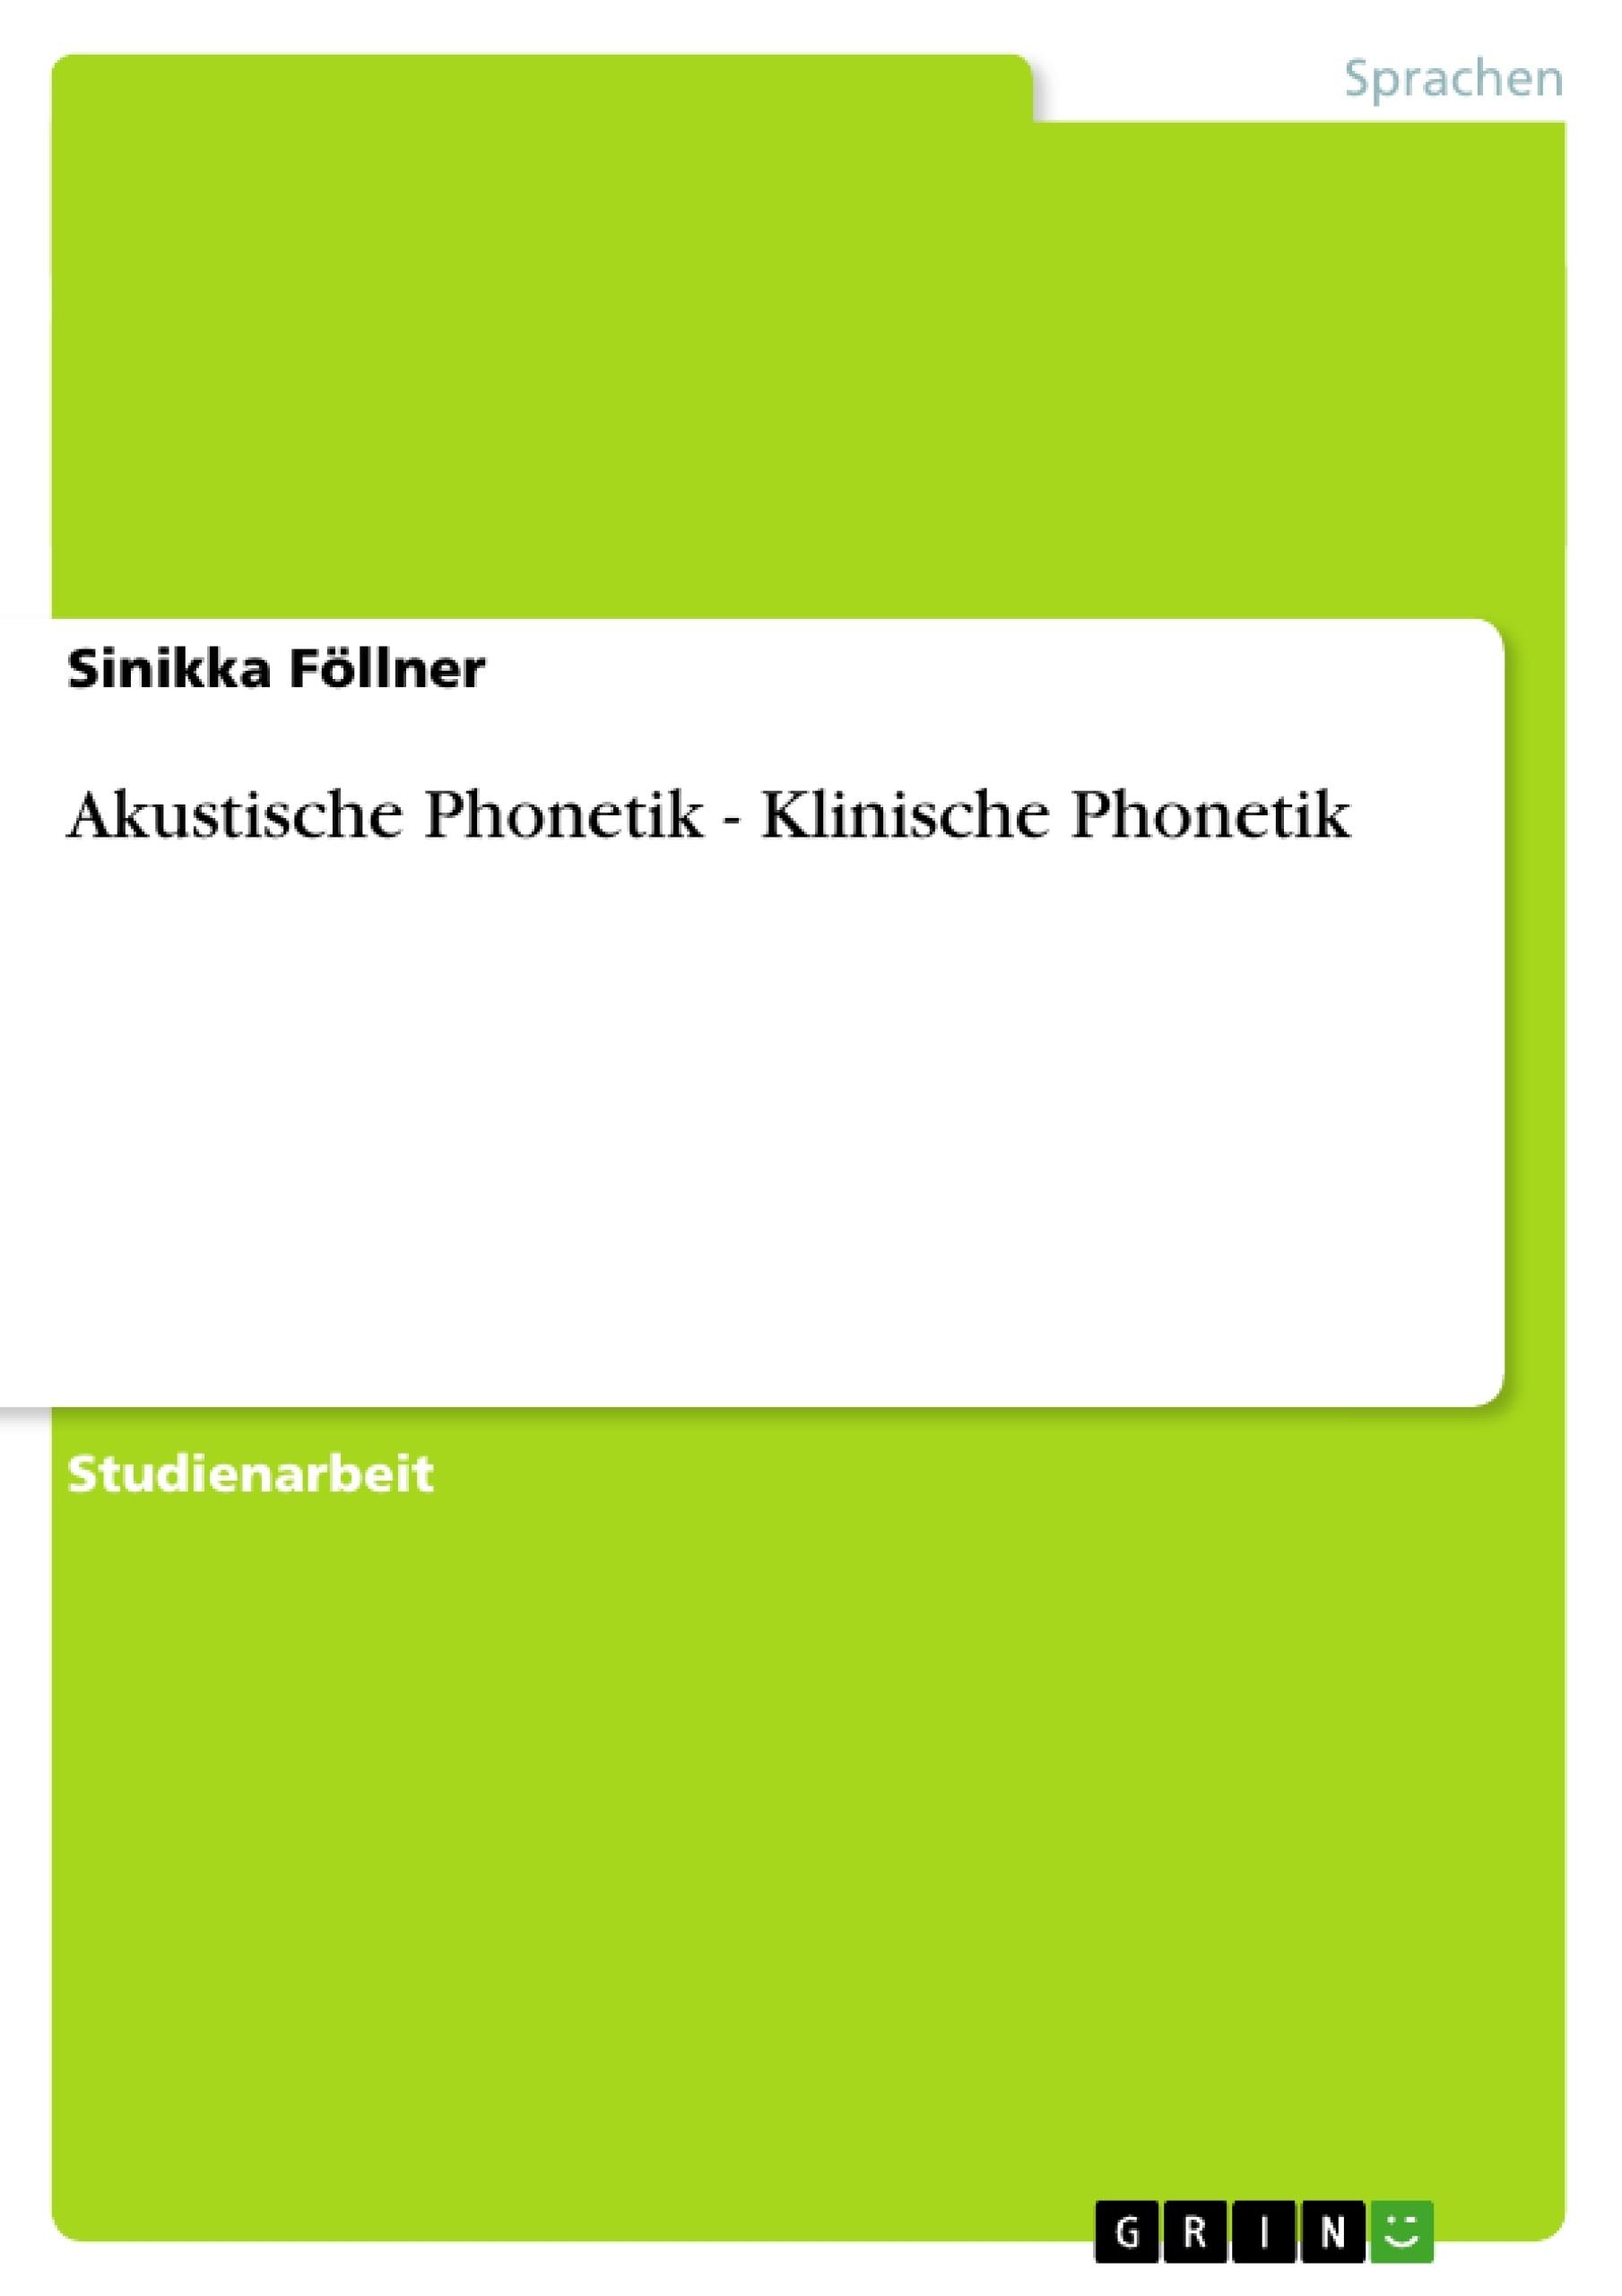 Titel: Akustische Phonetik  -  Klinische Phonetik